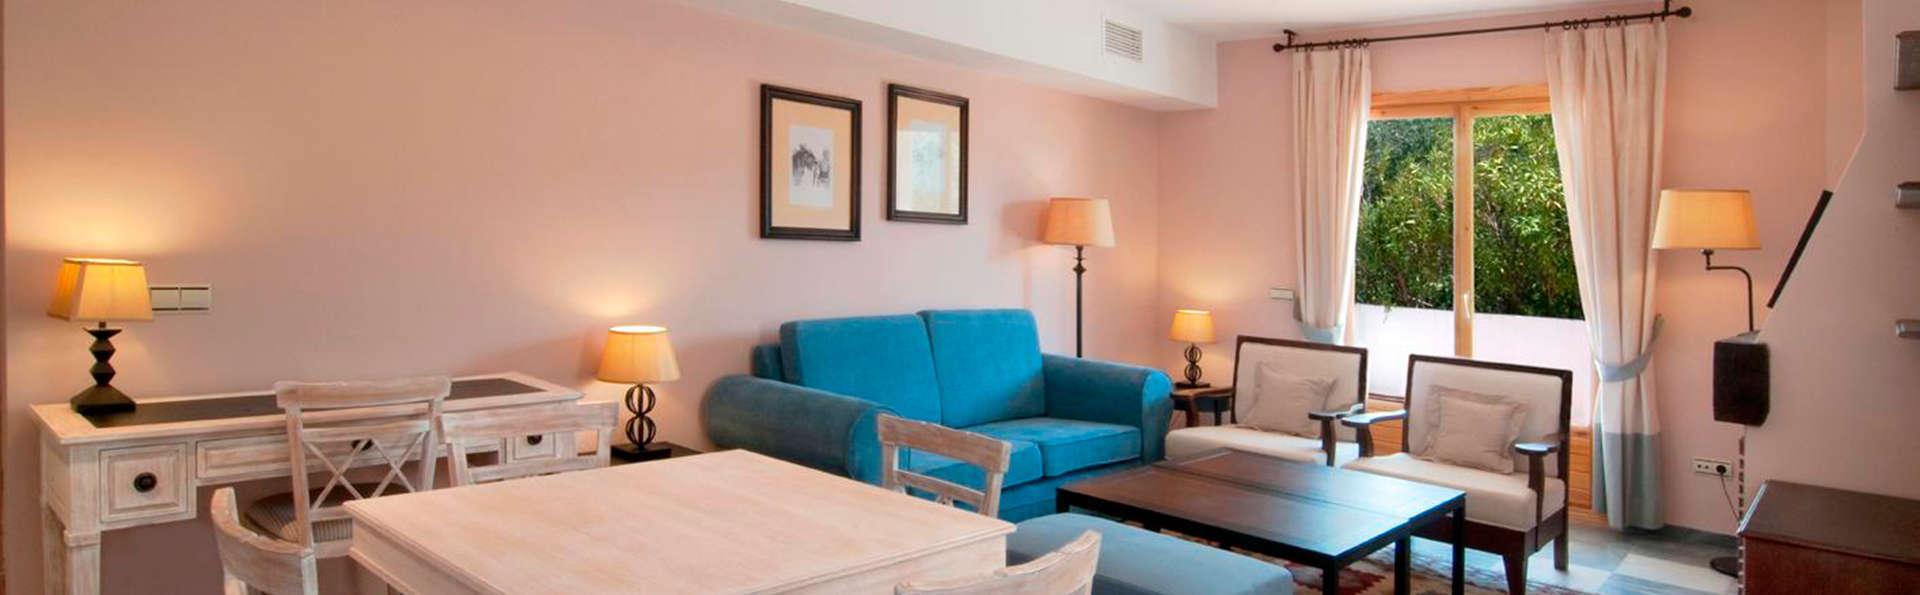 Hotel Villa de Laujar  - EDIT_salon.jpg